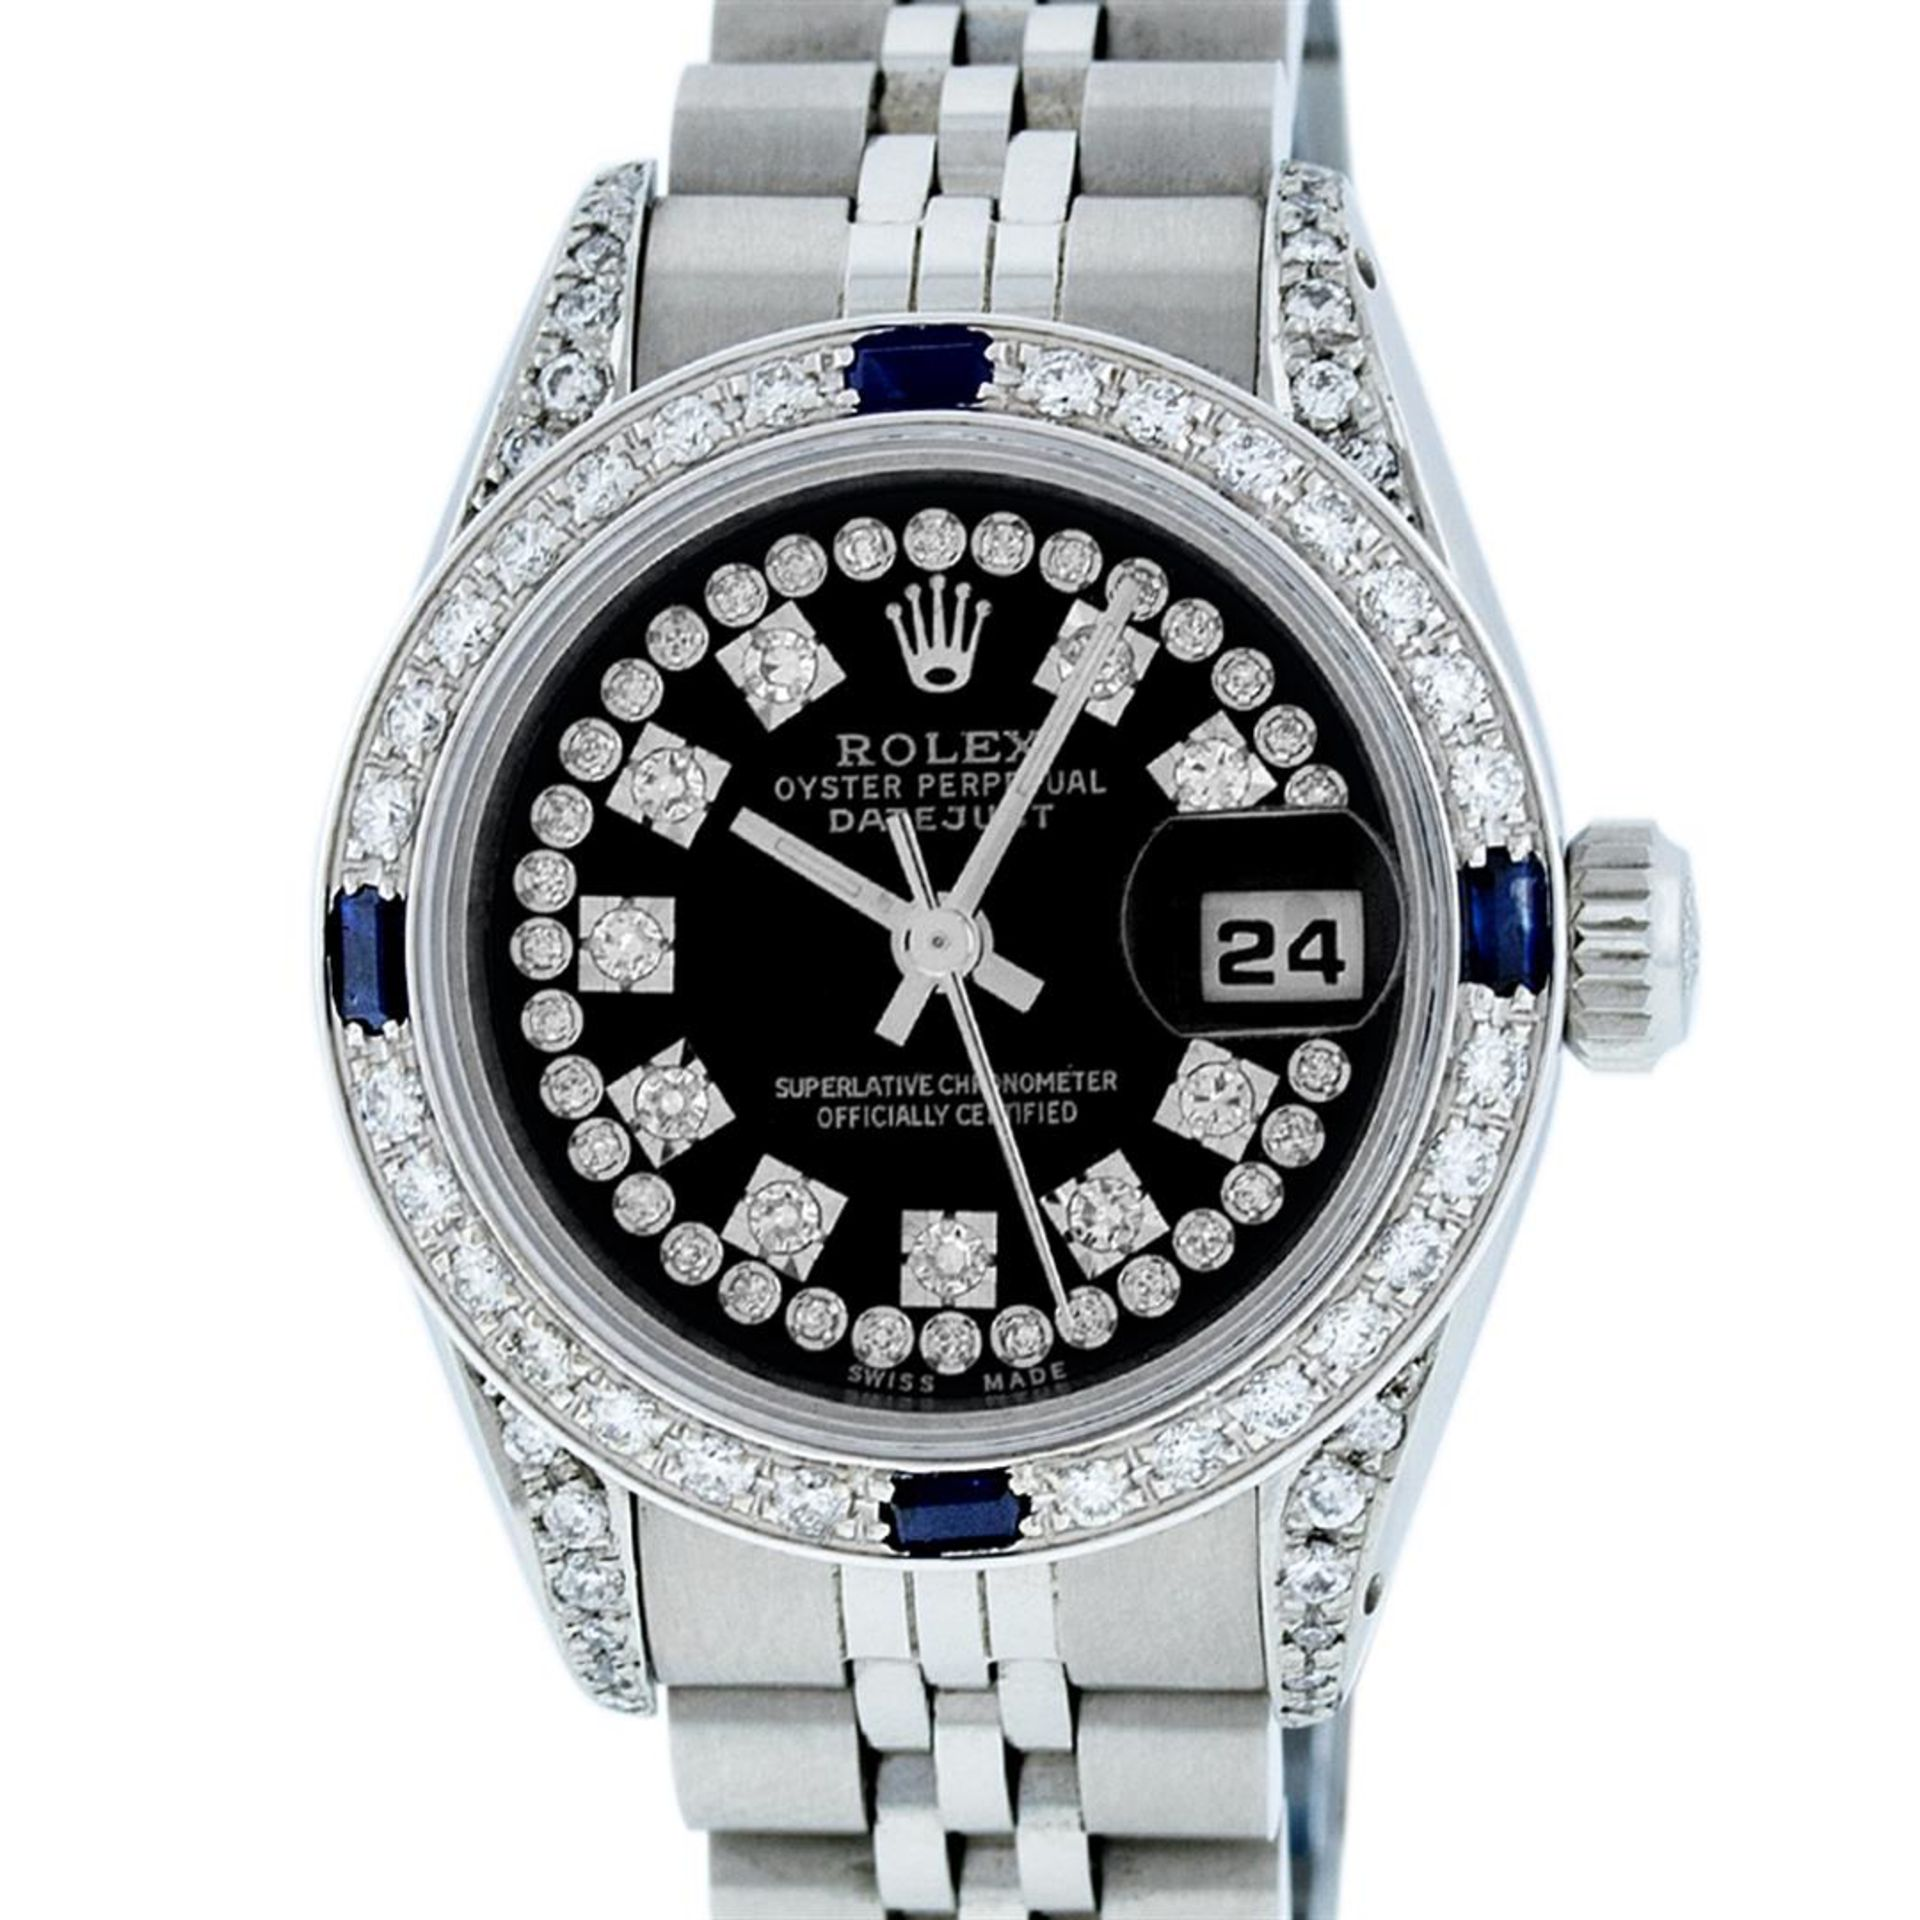 Rolex Ladies Stainless Steel 26MM Black String Diamond Lugs Datejust Wristwatch - Image 2 of 9